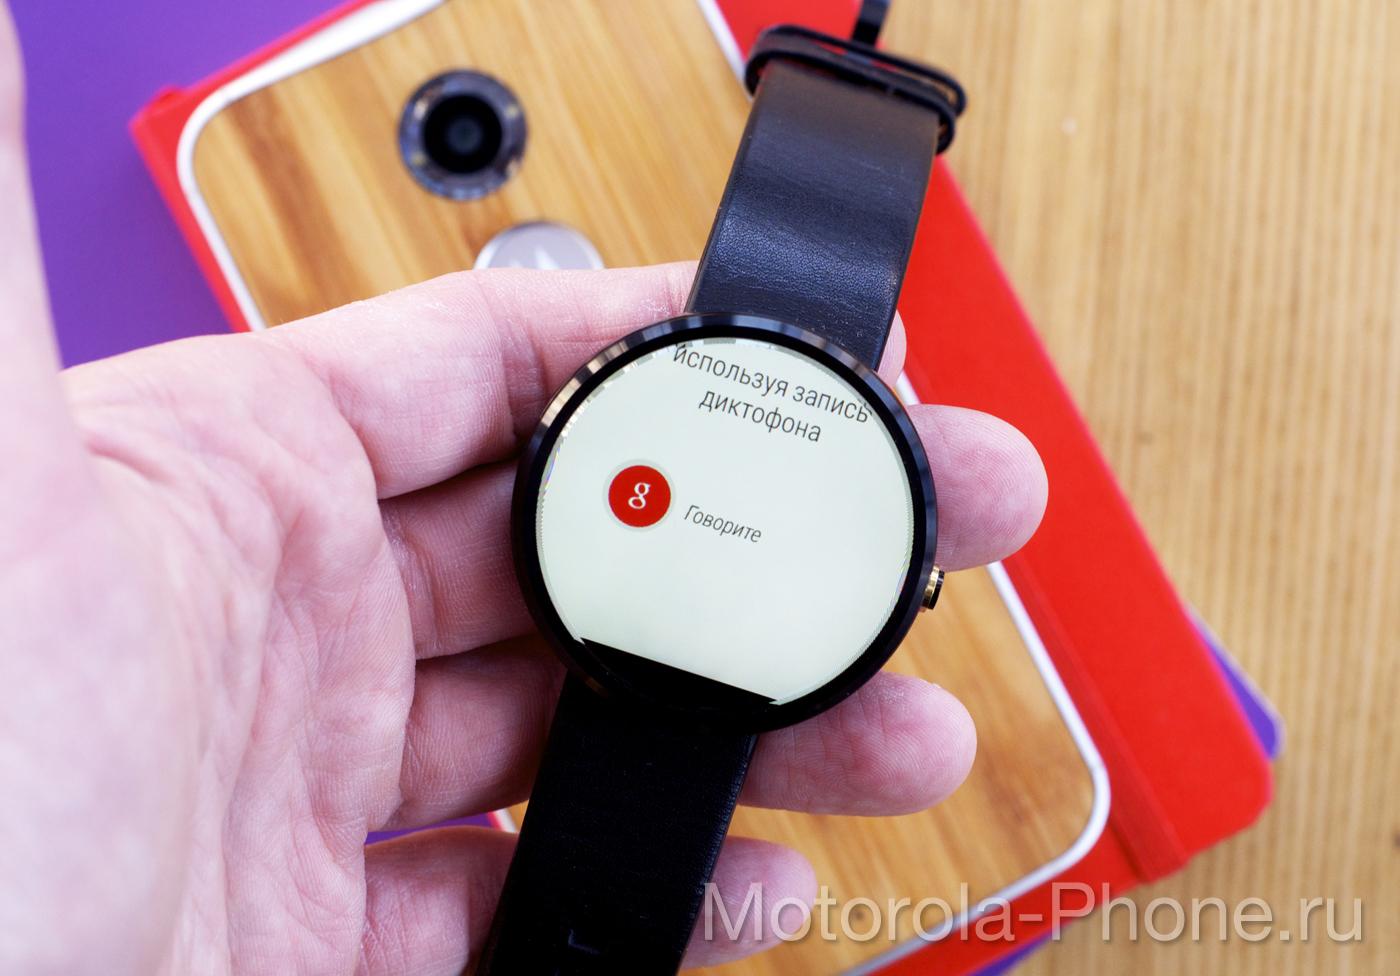 BBM-Android-Wear-Moto-05